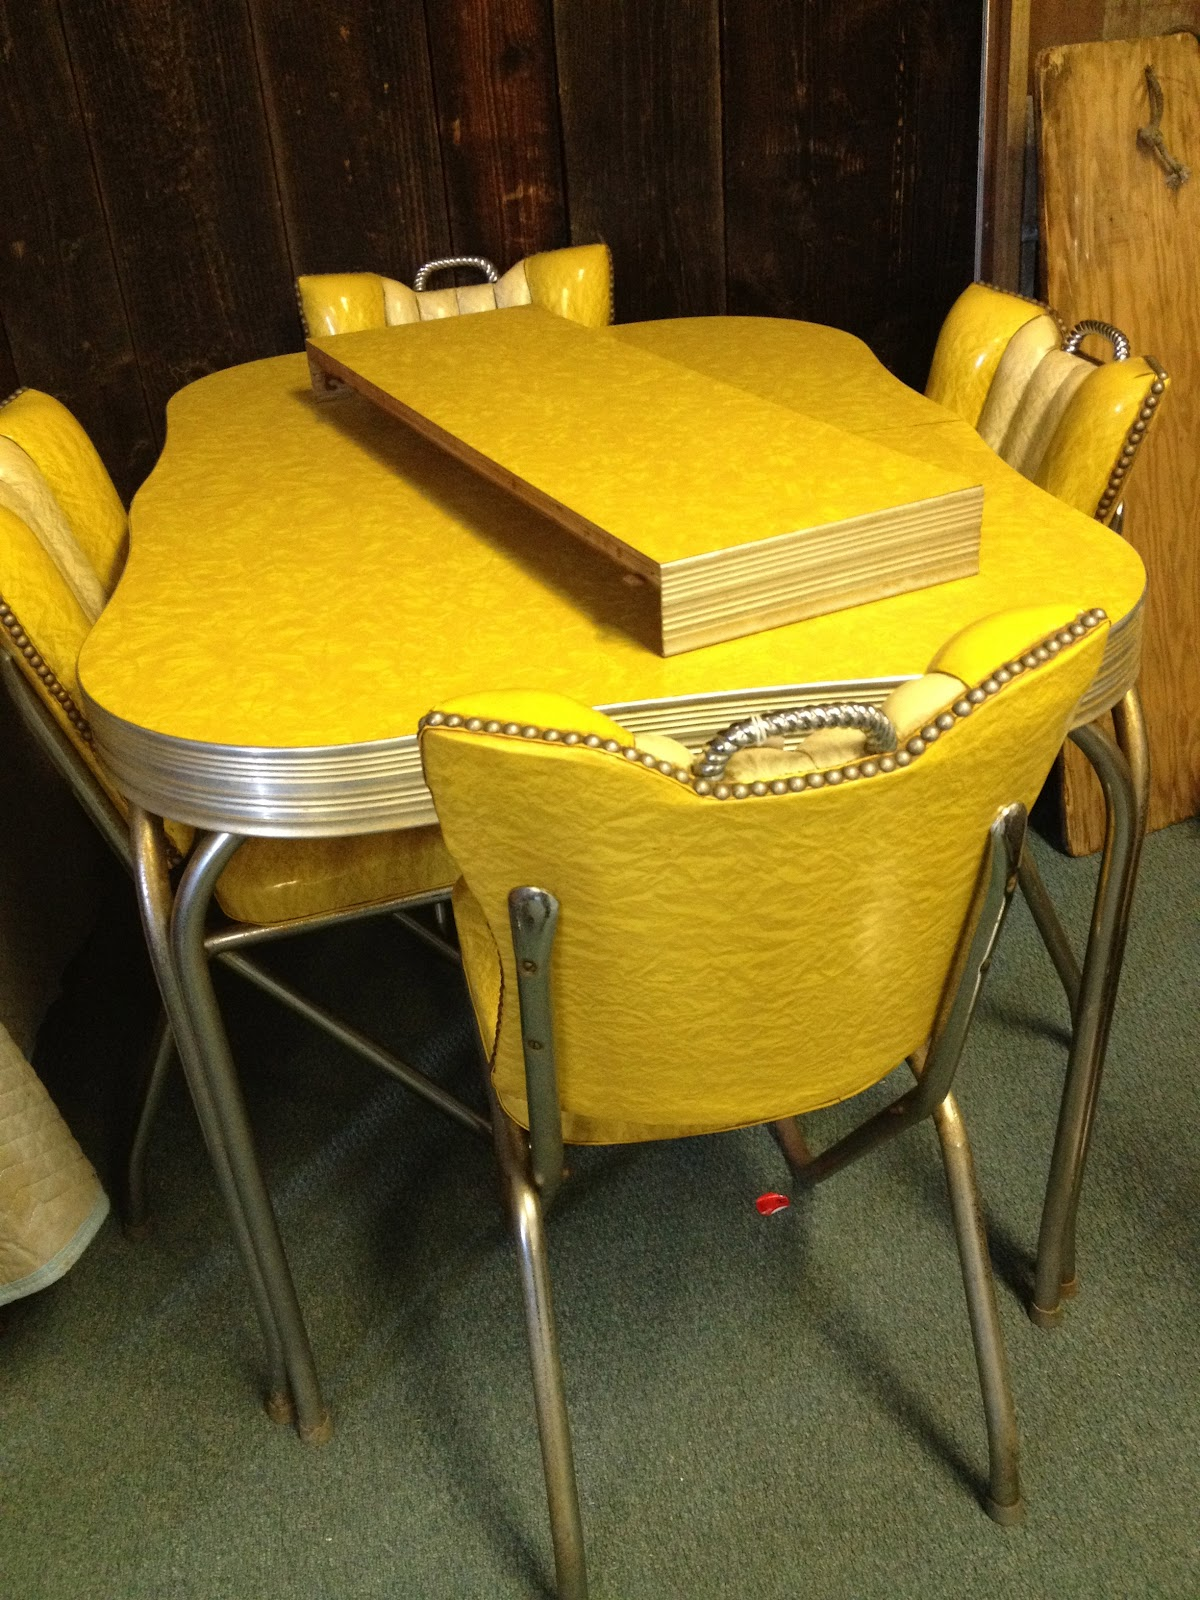 vintage kitchen table photo - 3